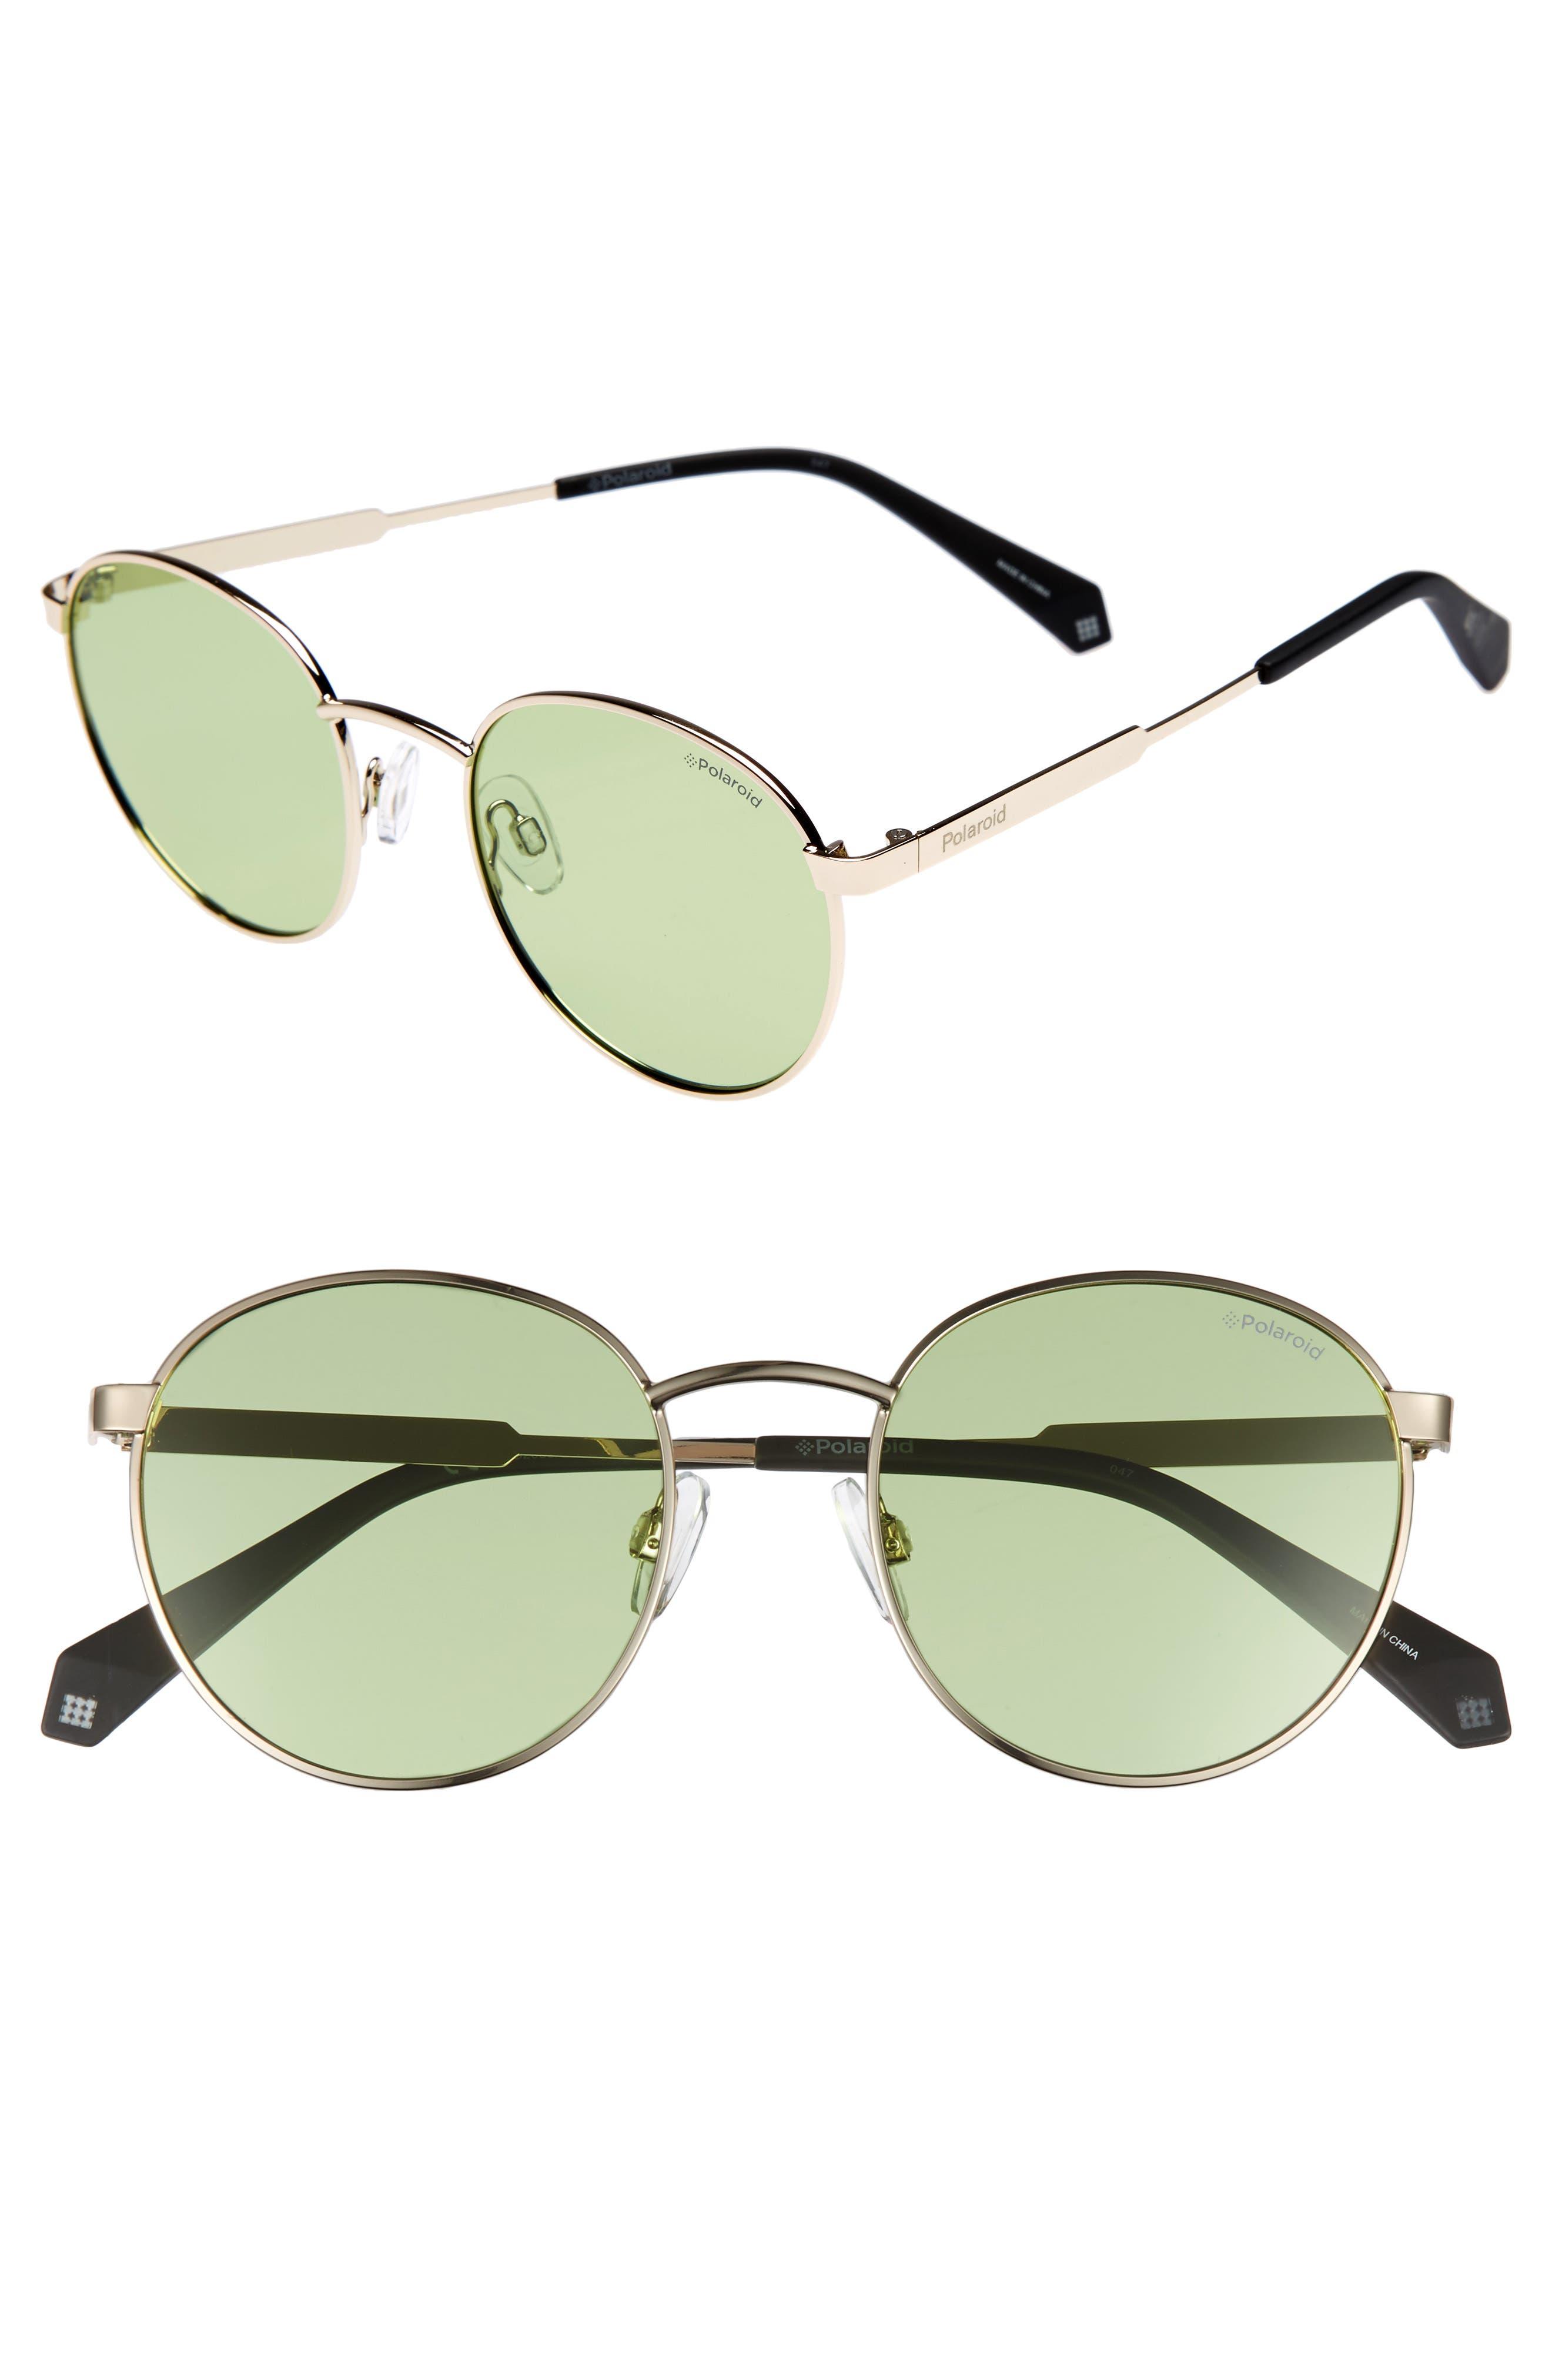 51mm Round Retro Polarized Sunglasses,                             Main thumbnail 1, color,                             300